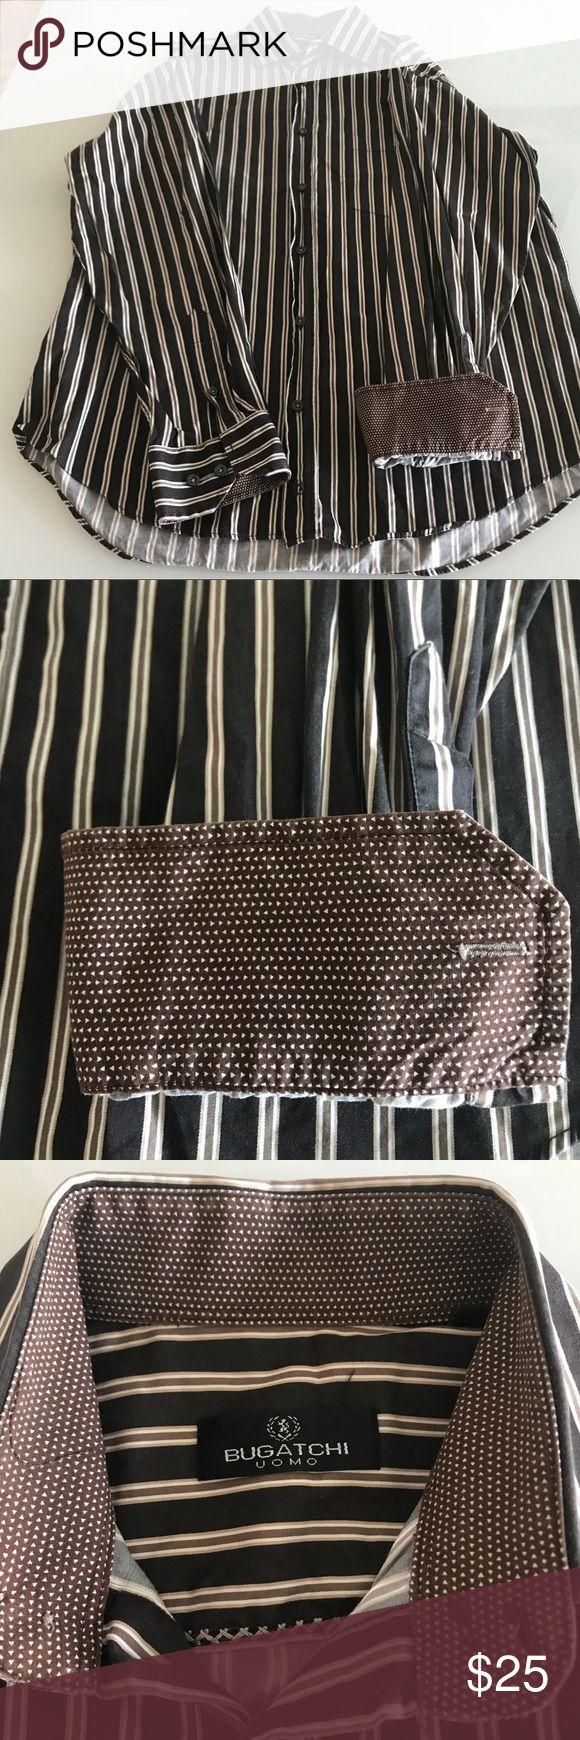 Men's Bugatchi Shirt Brown striped shirt  Spread collar Contrast flip-up cuff Size M 100% cotton Excellent condition Bugatchi Shirts Casual Button Down Shirts